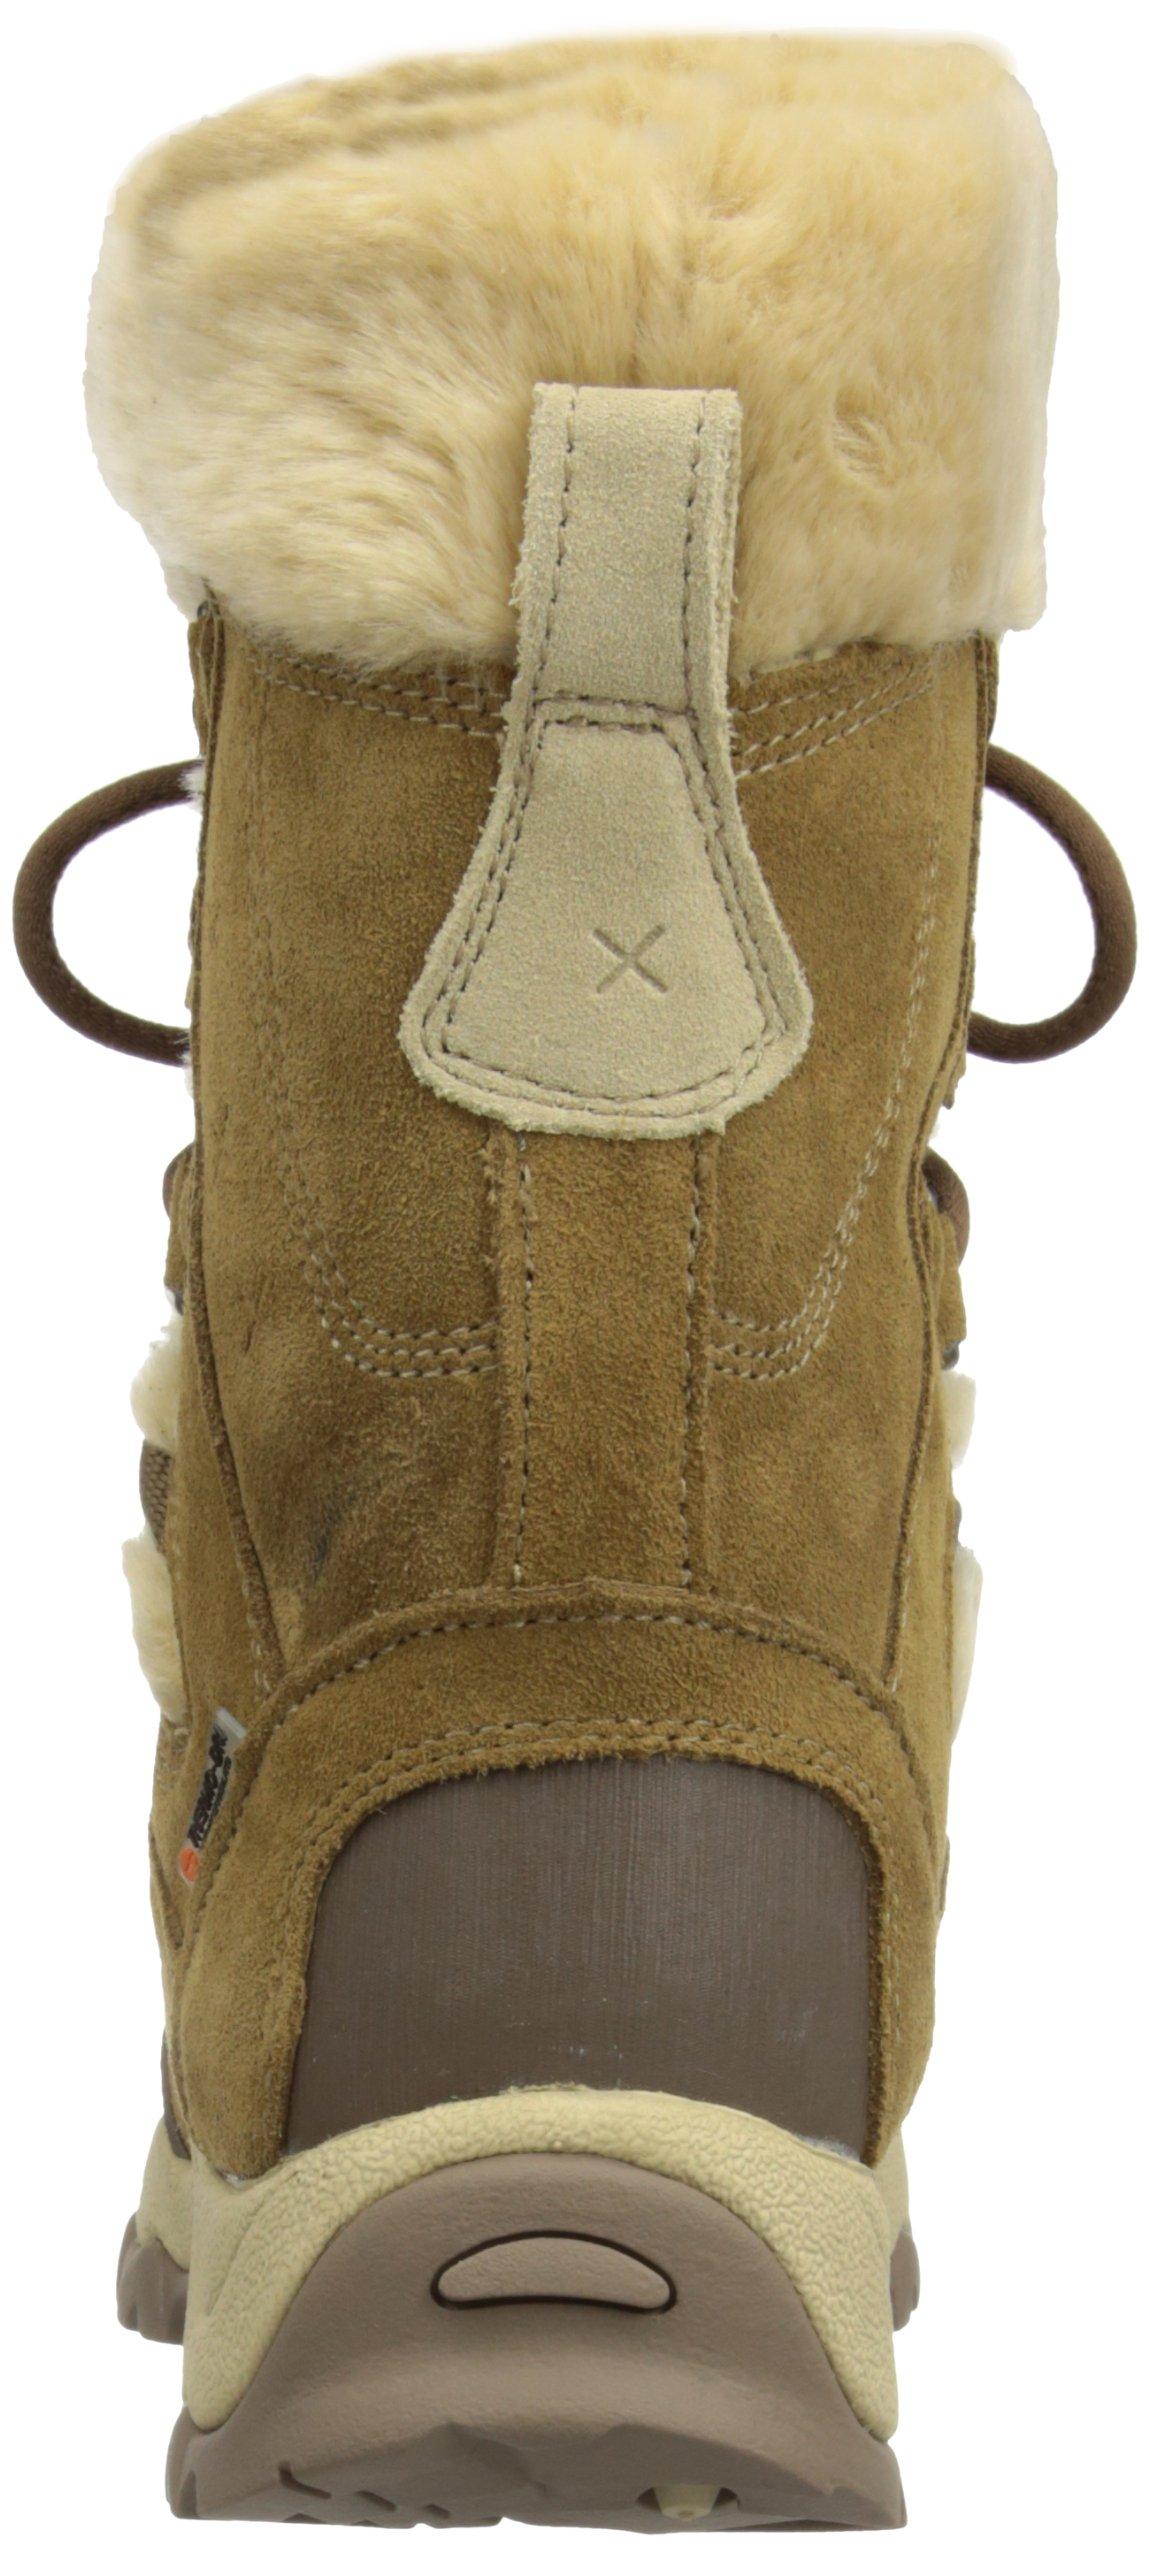 Hi-Tec ST Moritz, Women's Hiking Boots 2